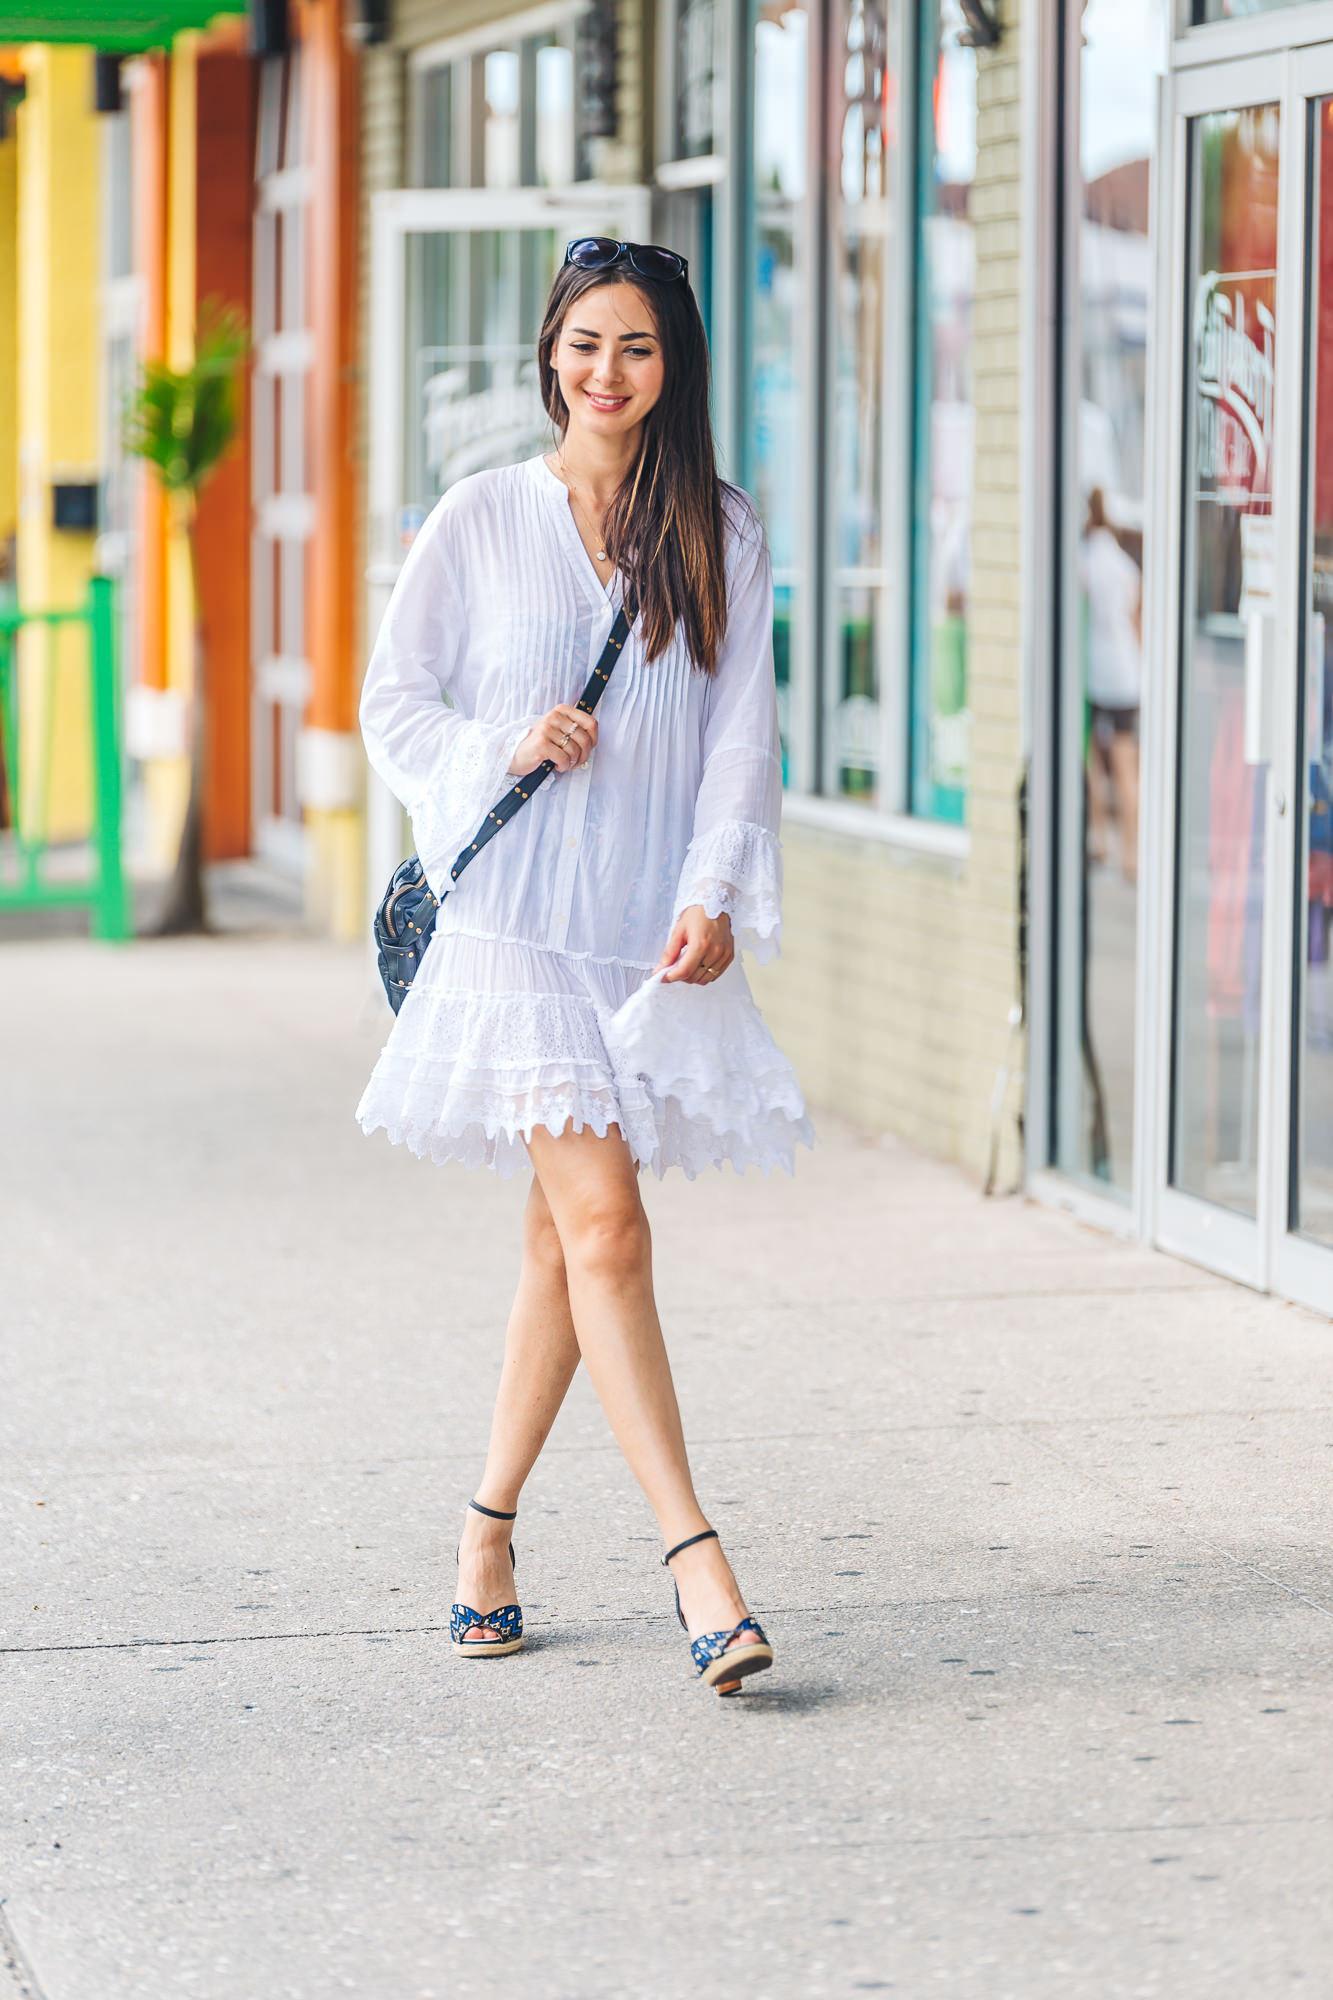 Amita Naithani Dress   //   Seychelles Sandals